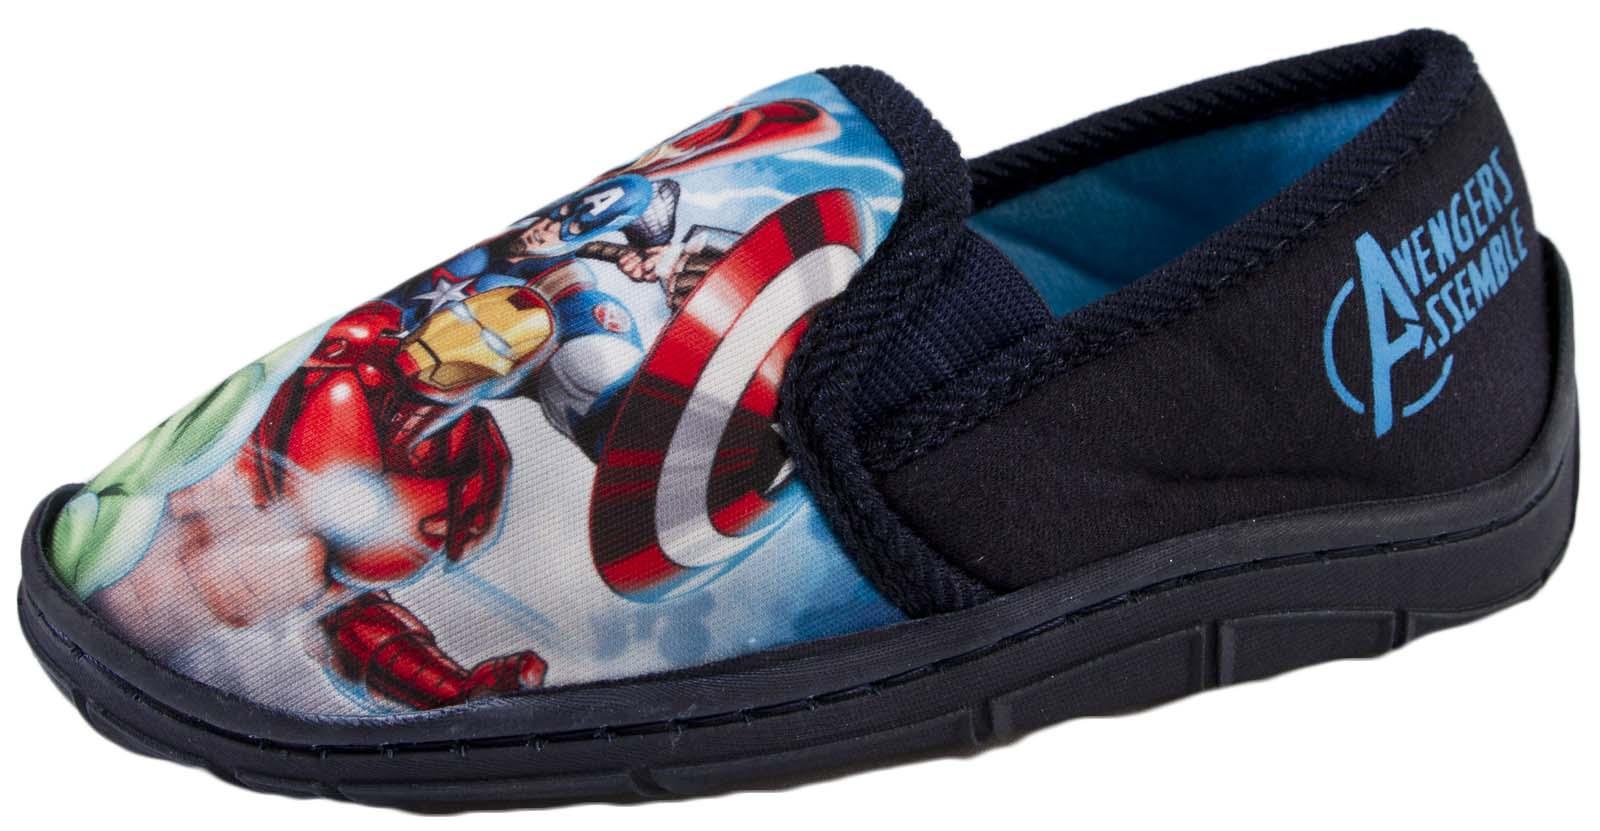 Boys Slipper Shoes